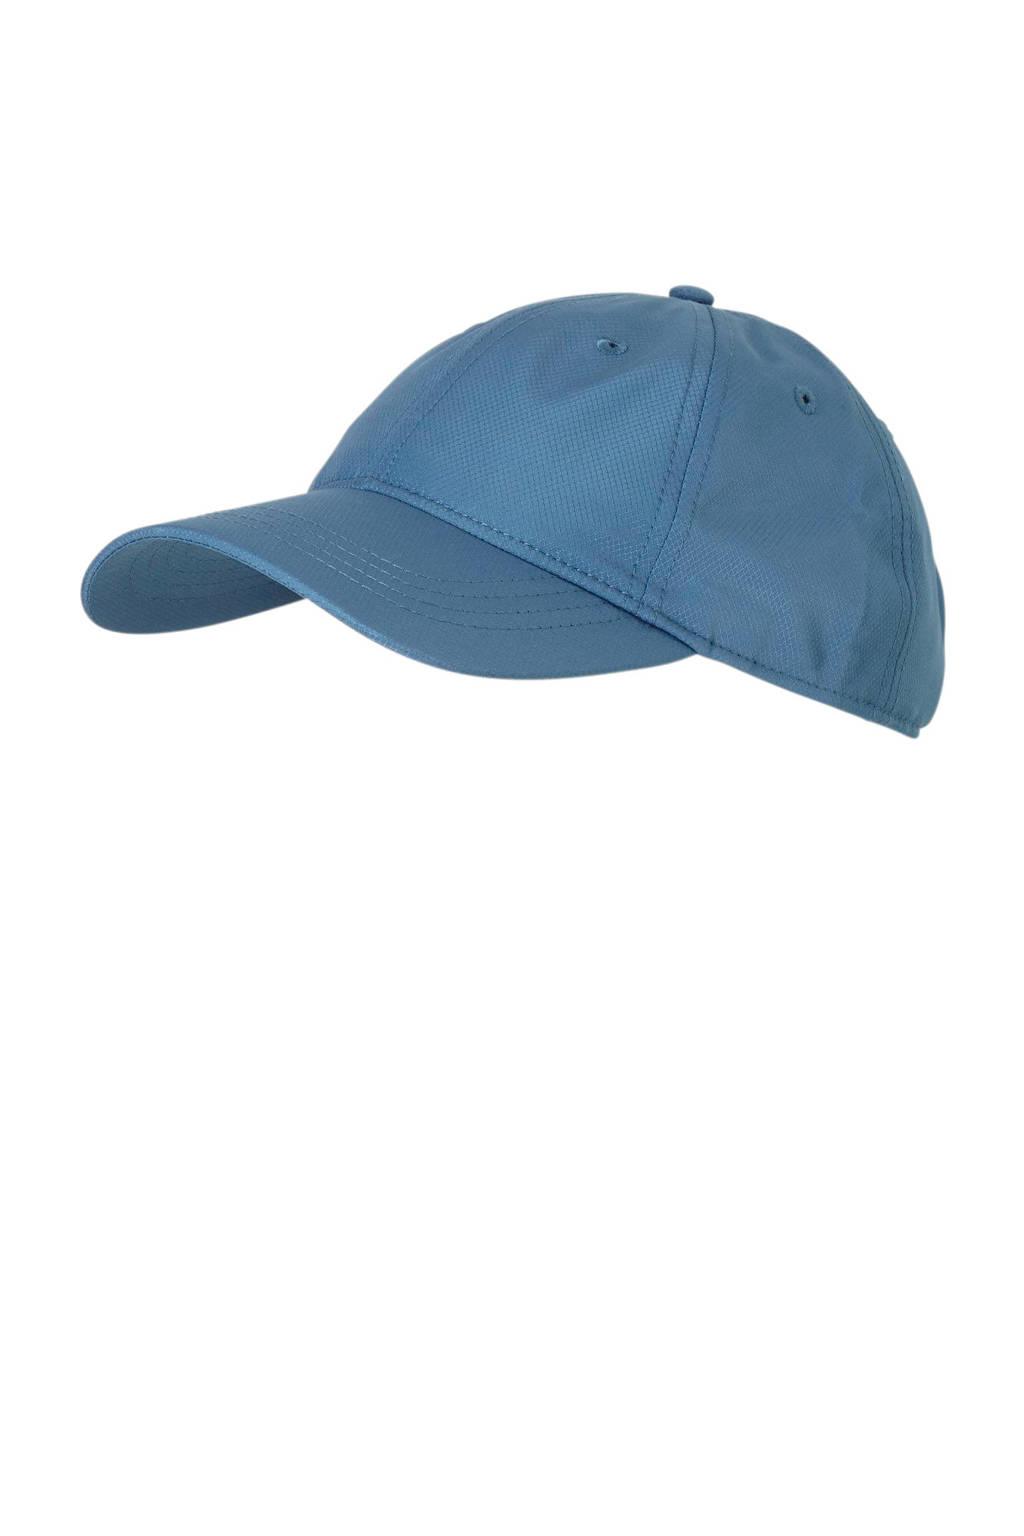 Lacoste pet, Blauw